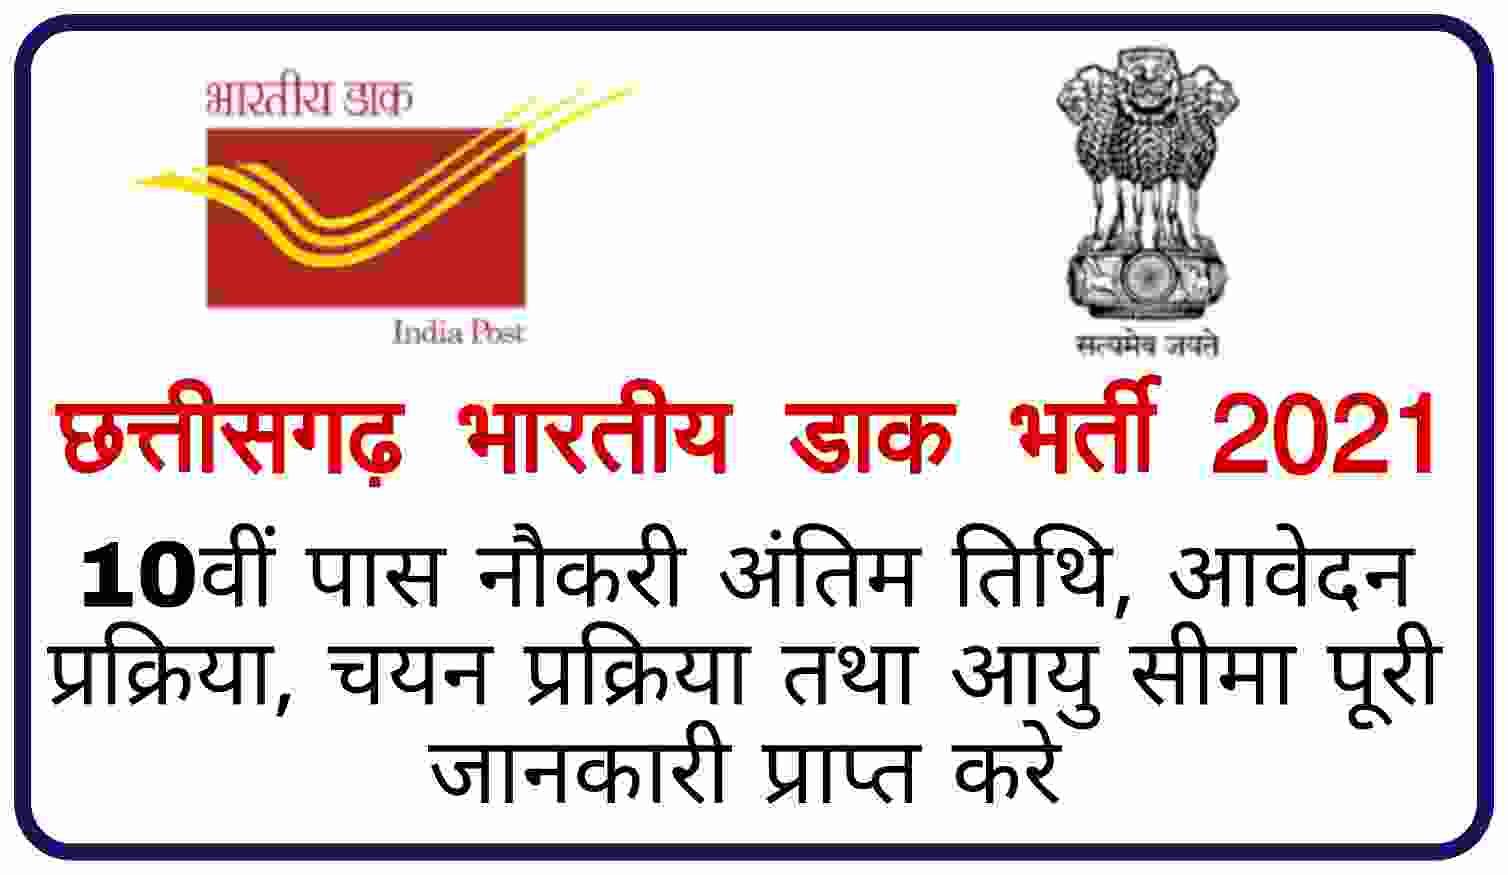 Chhattisgarh Post Office Recruitment 2021